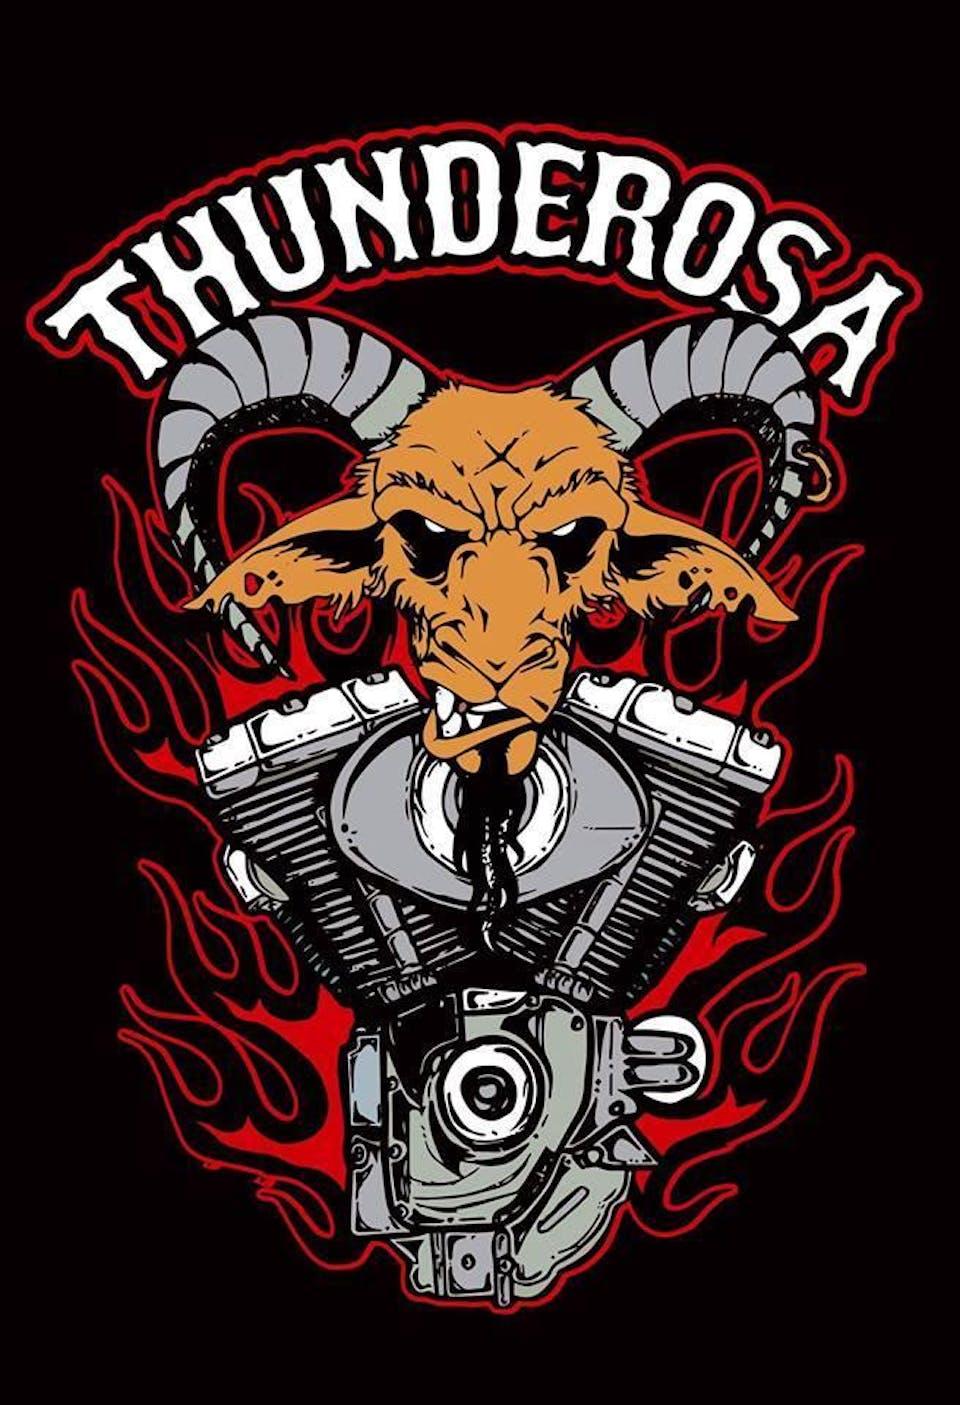 Thunderosa @ Mohawk (Indoor)